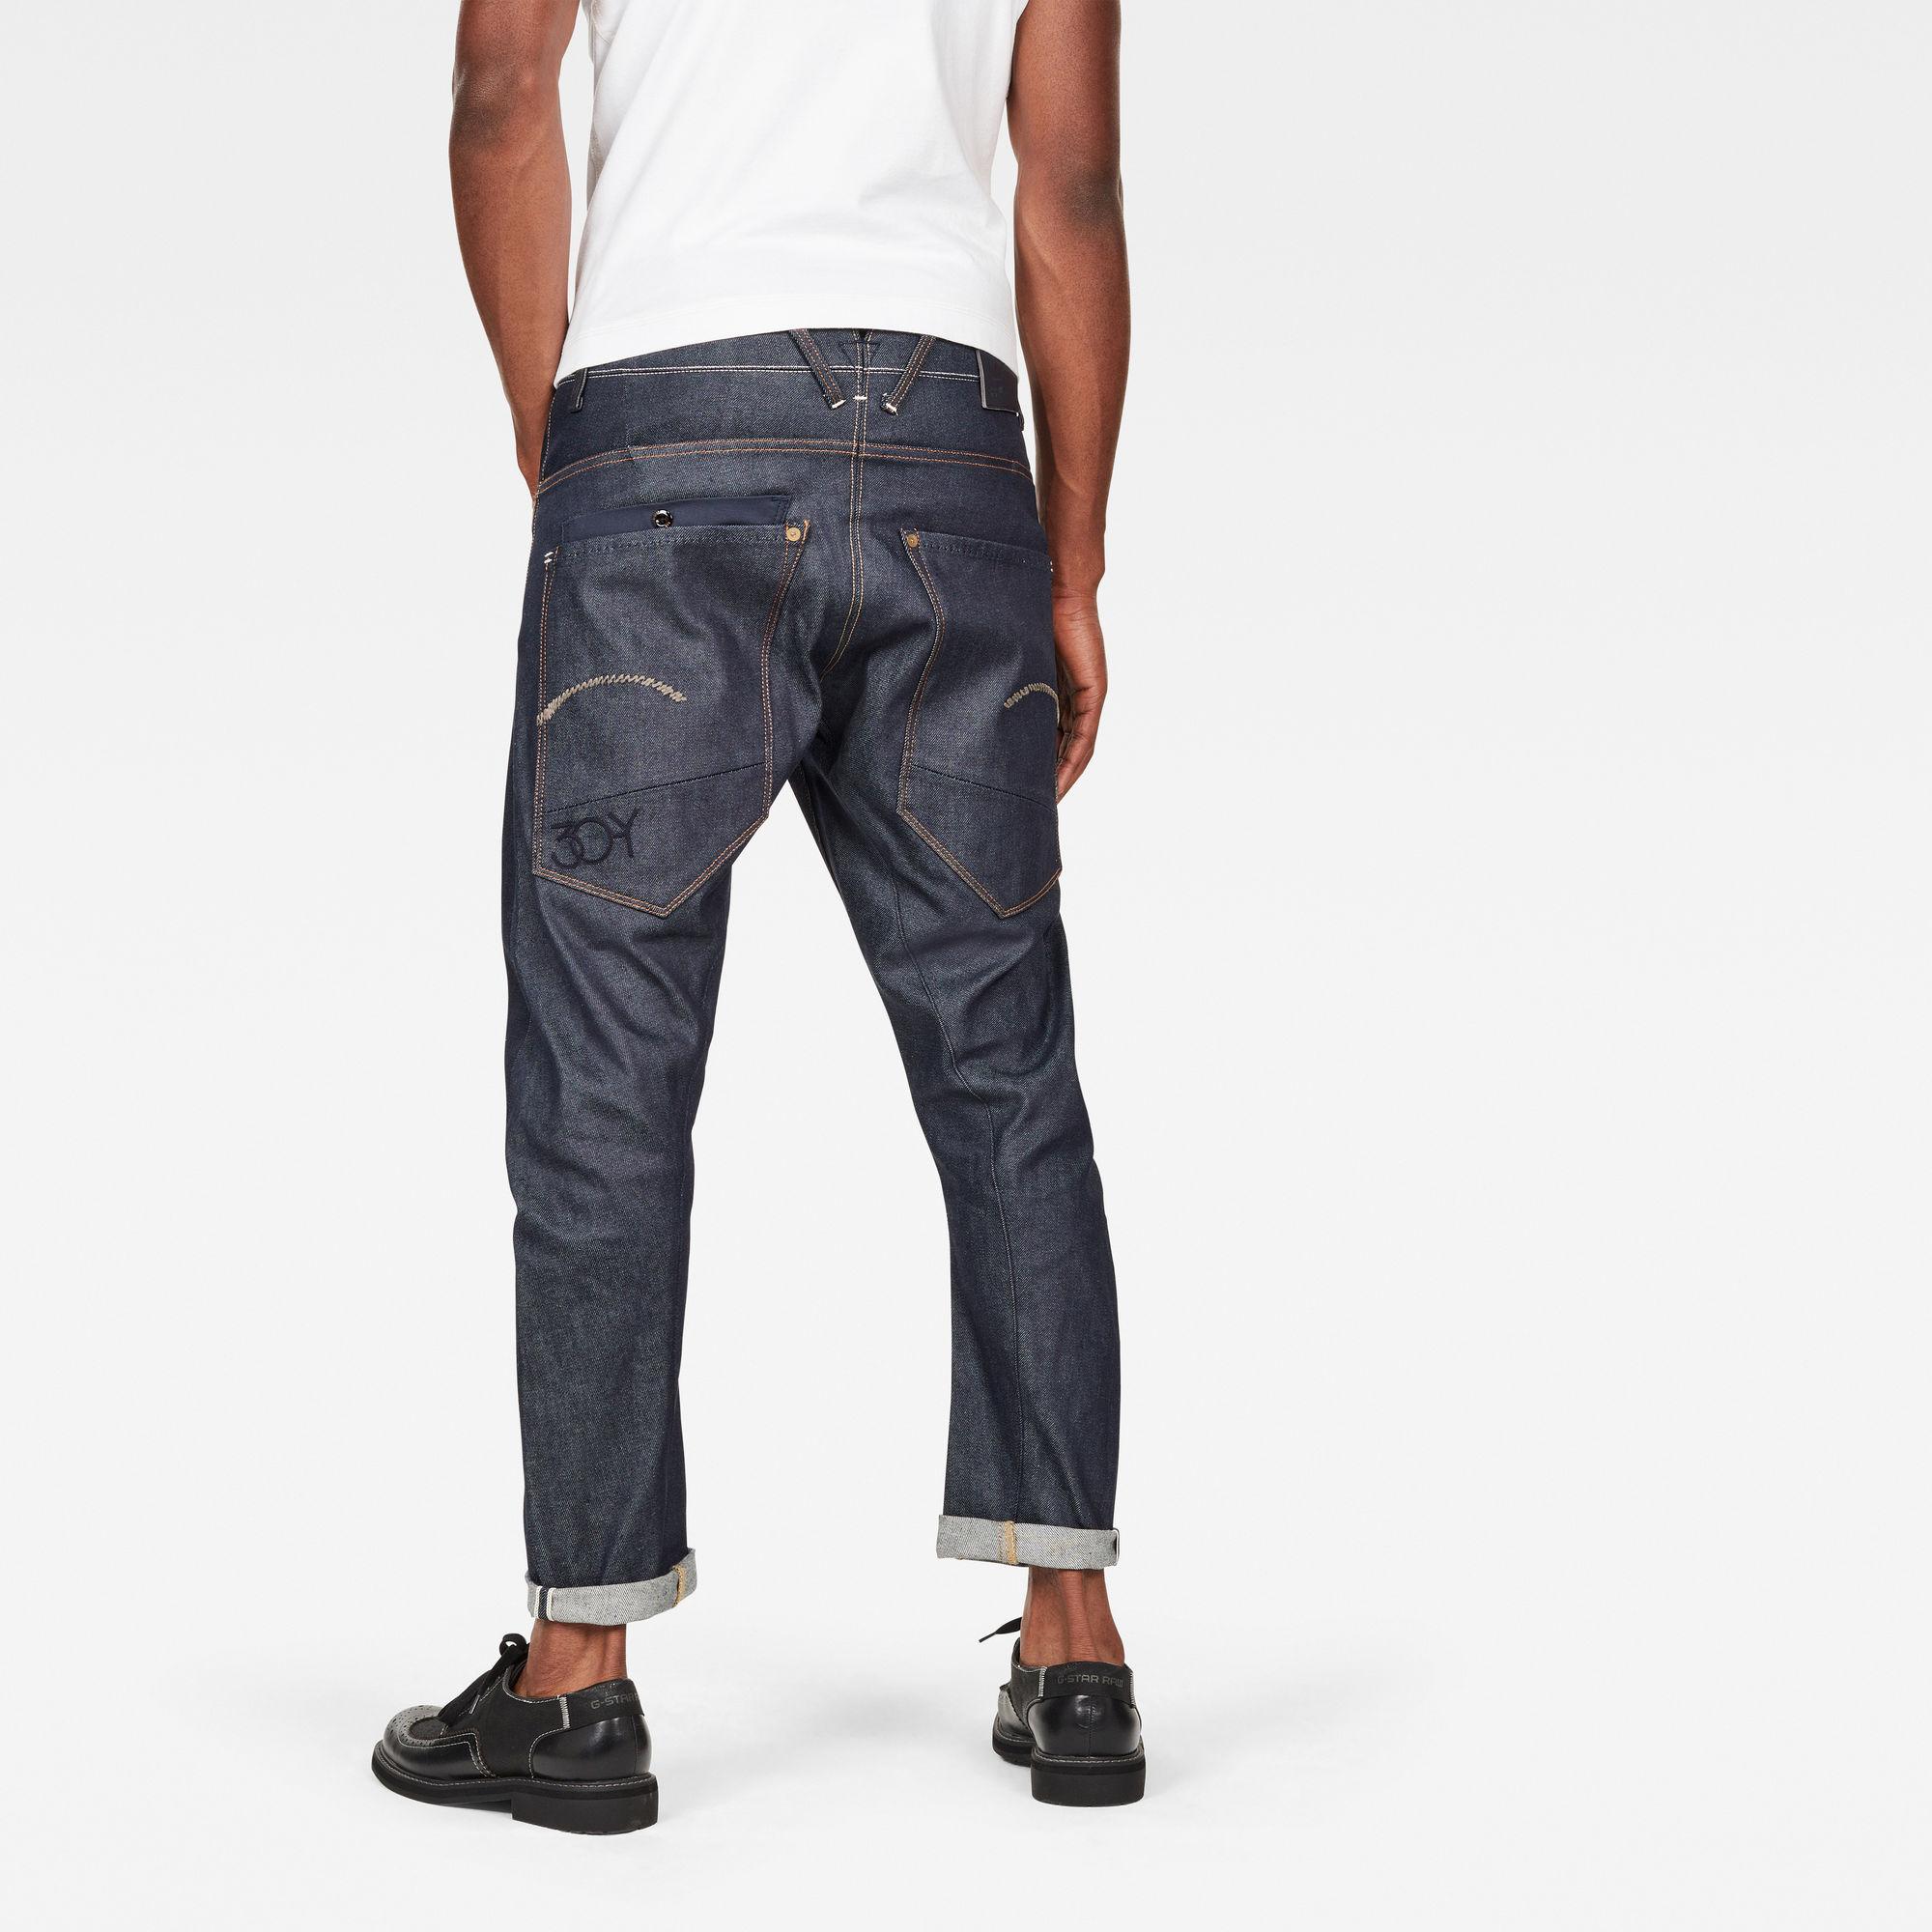 G-Star RAW 30 Years New York RAW Type C Tapered Jeans